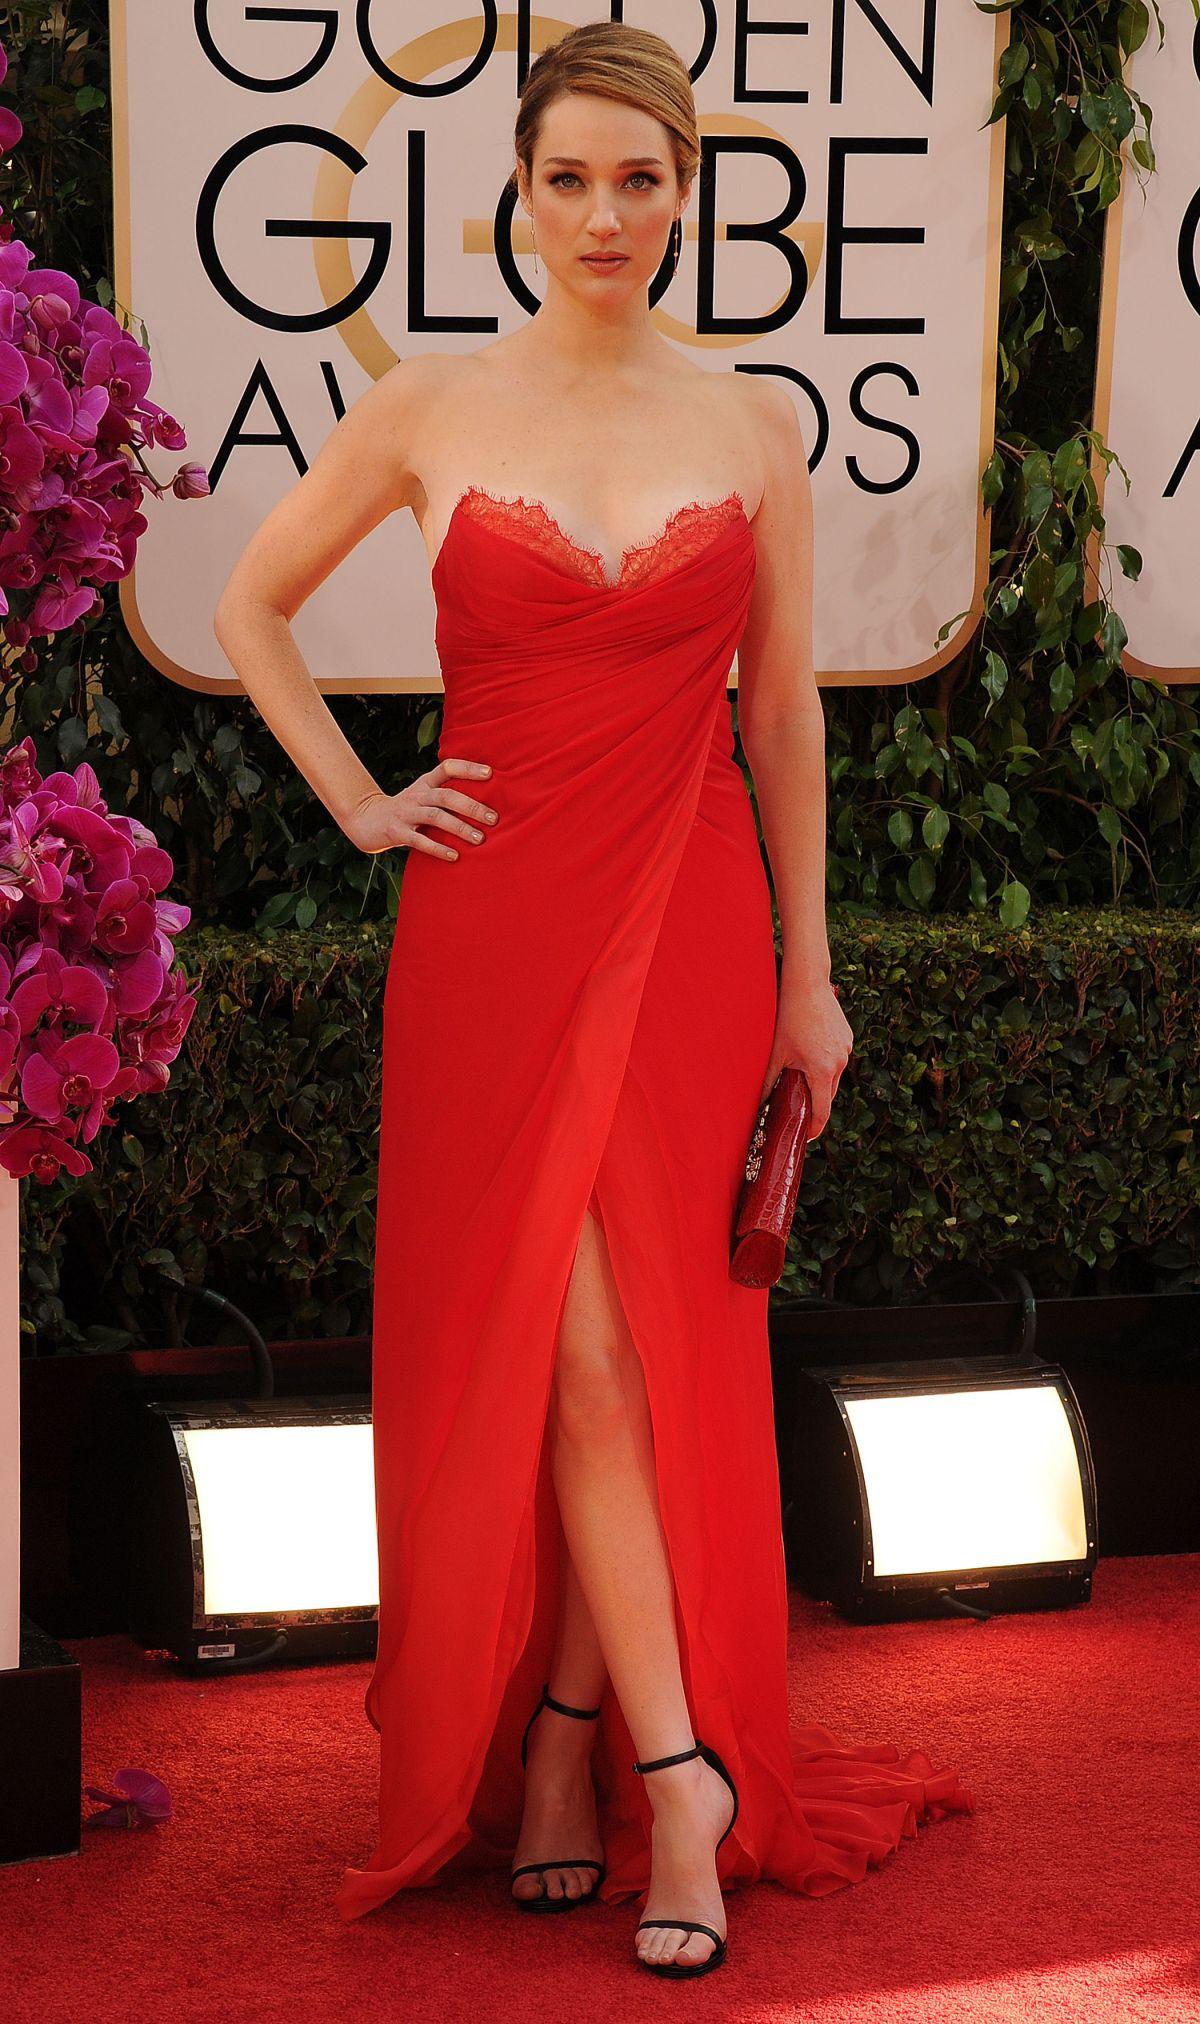 KRISTEN CONNOLLY at 71st Annual Golden Globe Awards